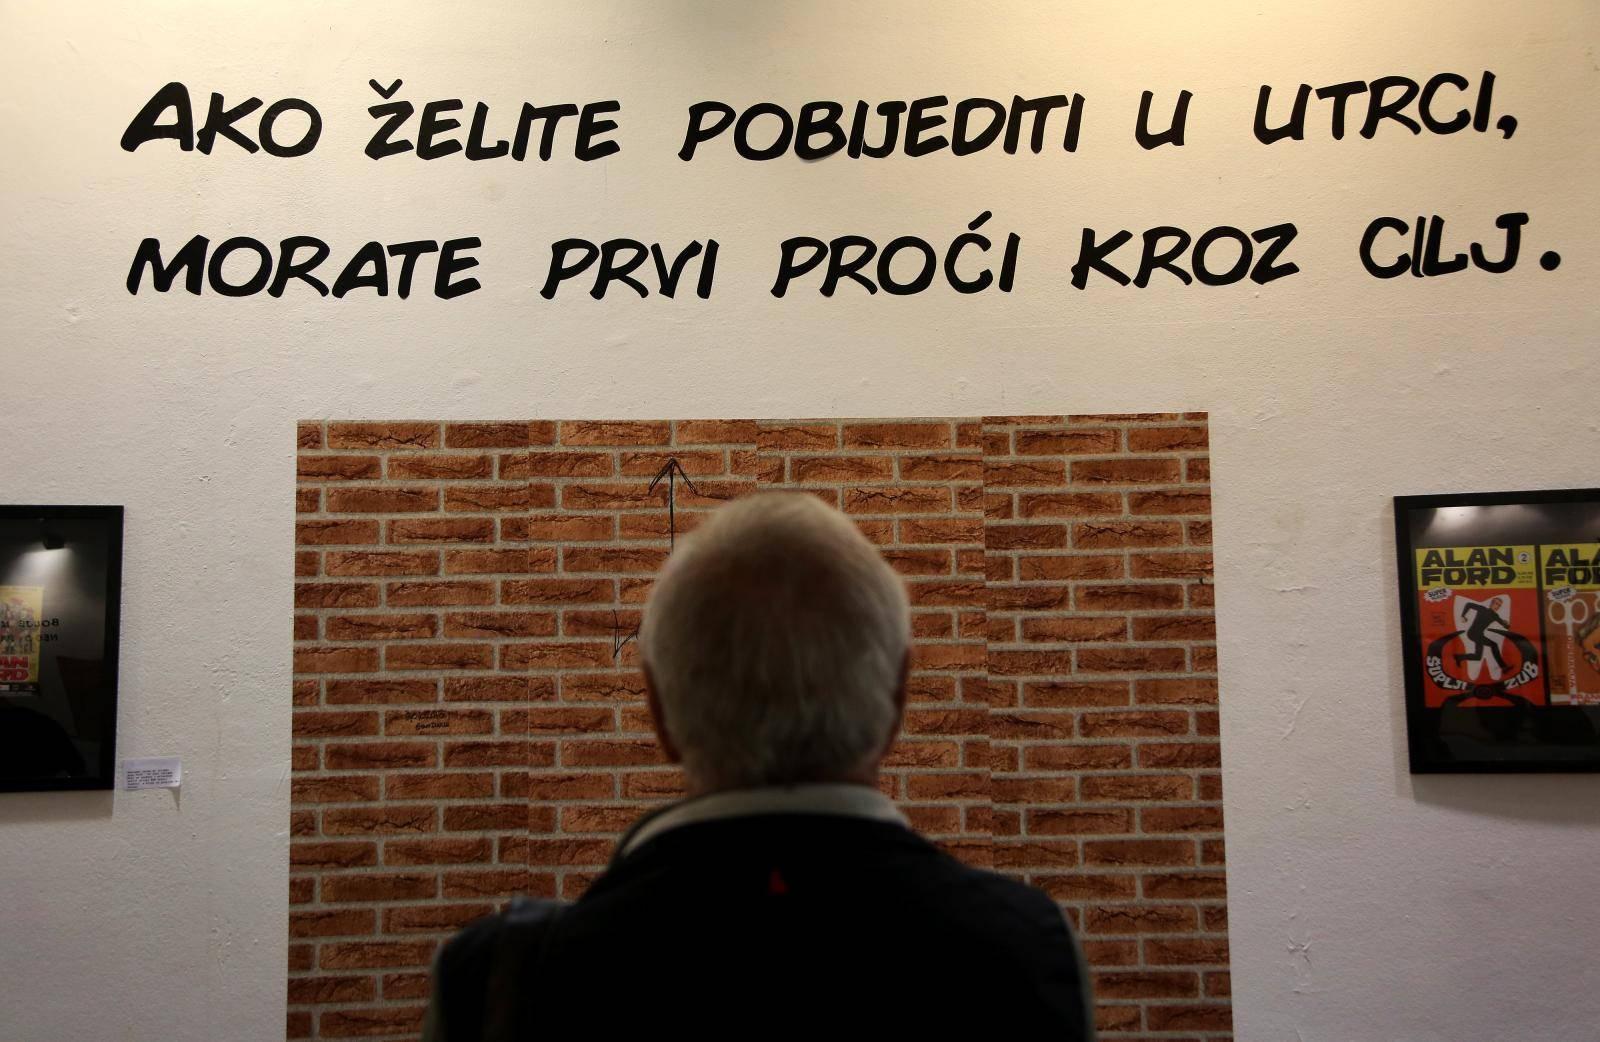 Zagreb: Izložba Crtani romani šou